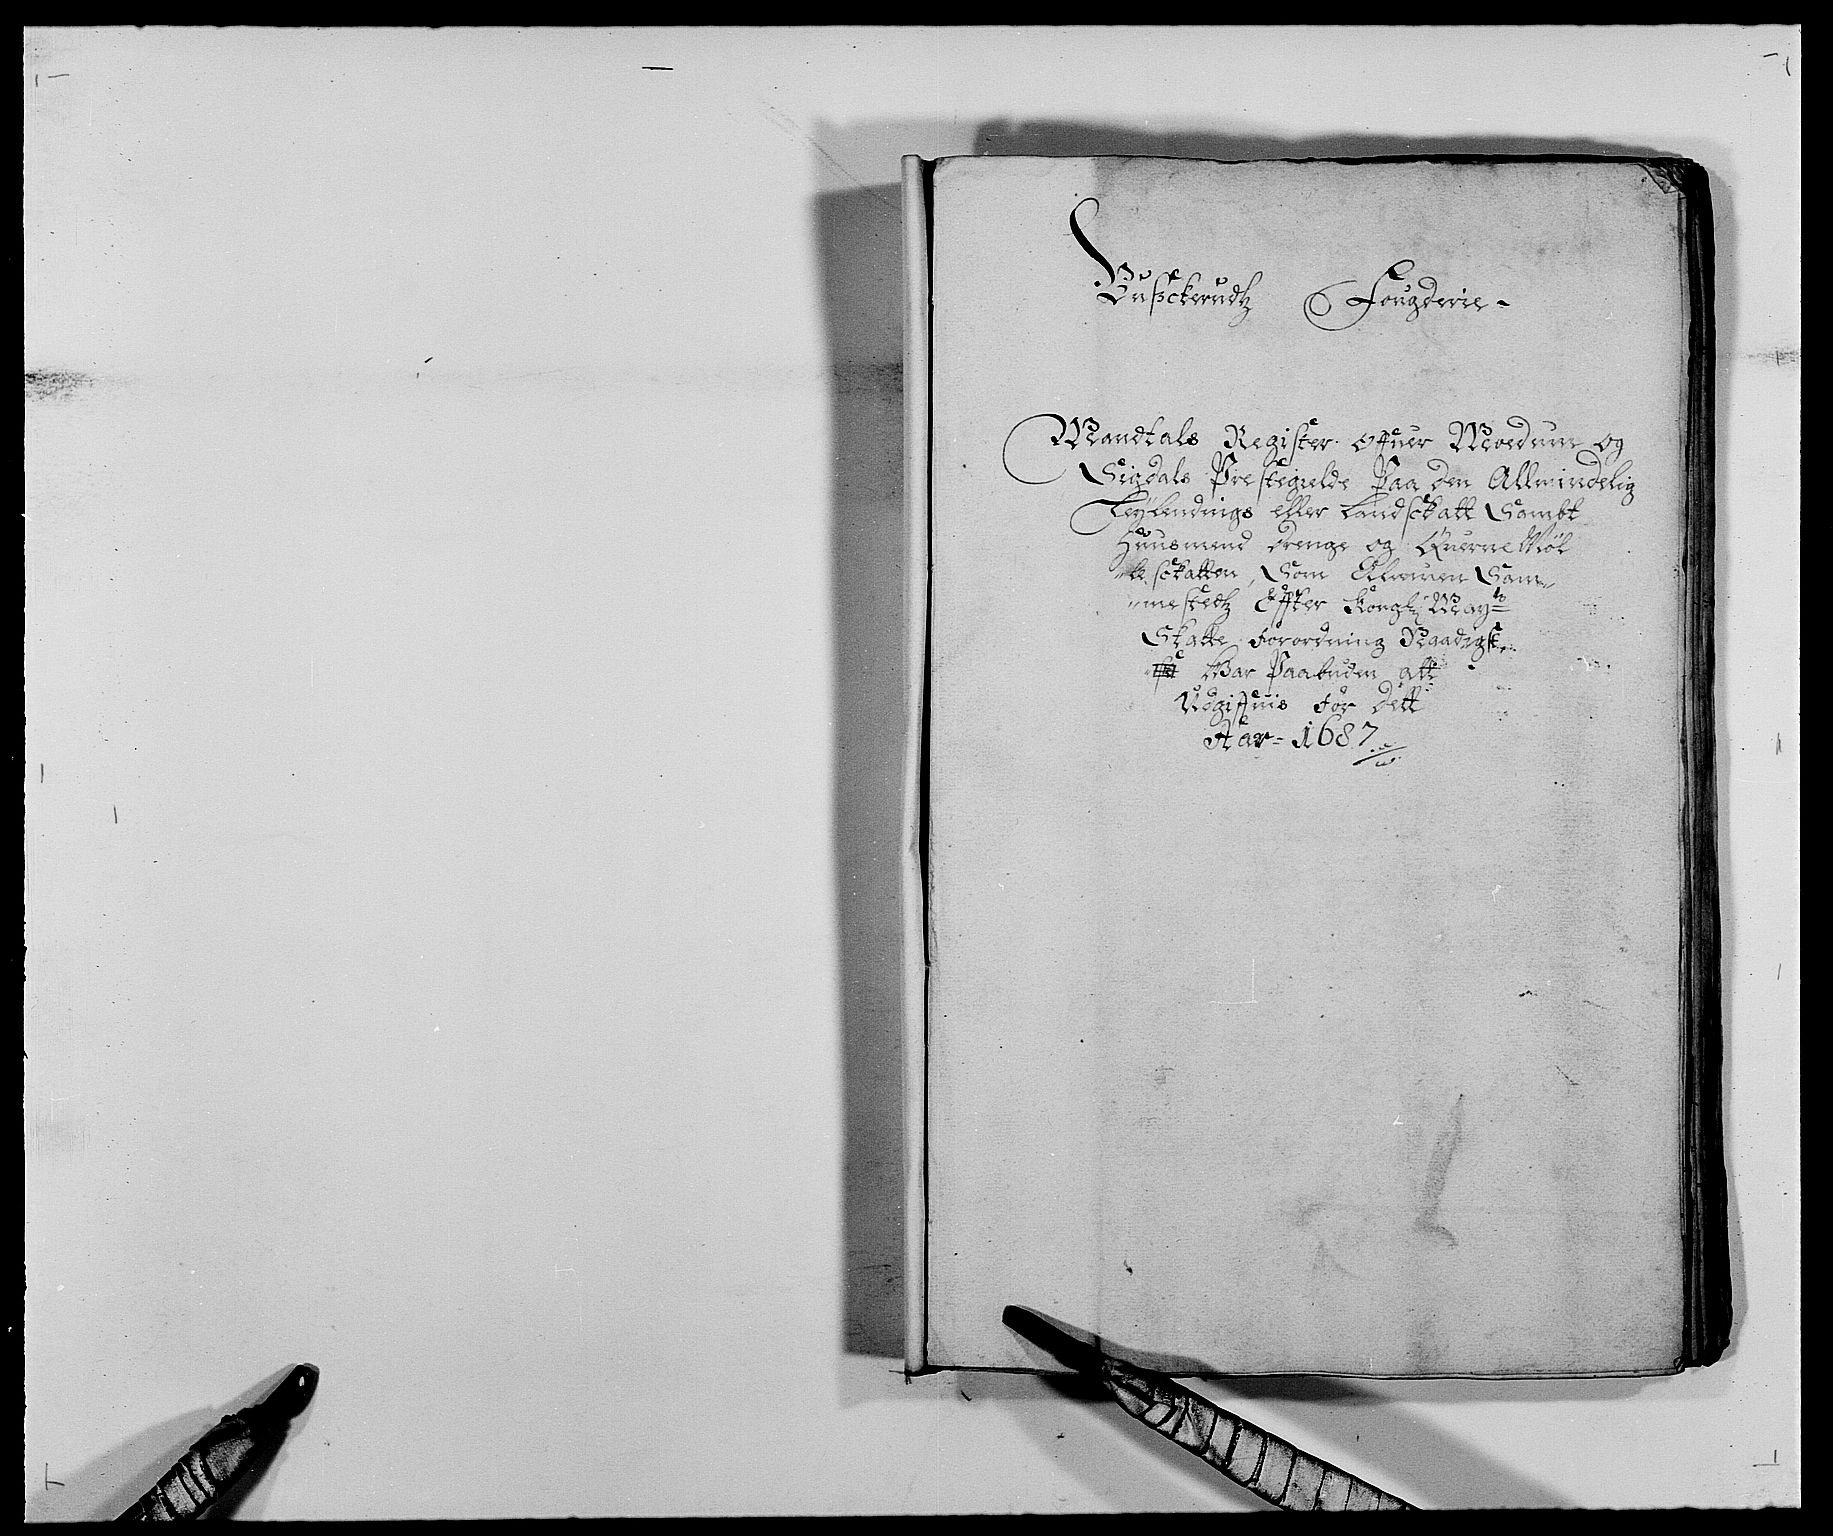 RA, Rentekammeret inntil 1814, Reviderte regnskaper, Fogderegnskap, R25/L1679: Fogderegnskap Buskerud, 1687-1688, s. 74